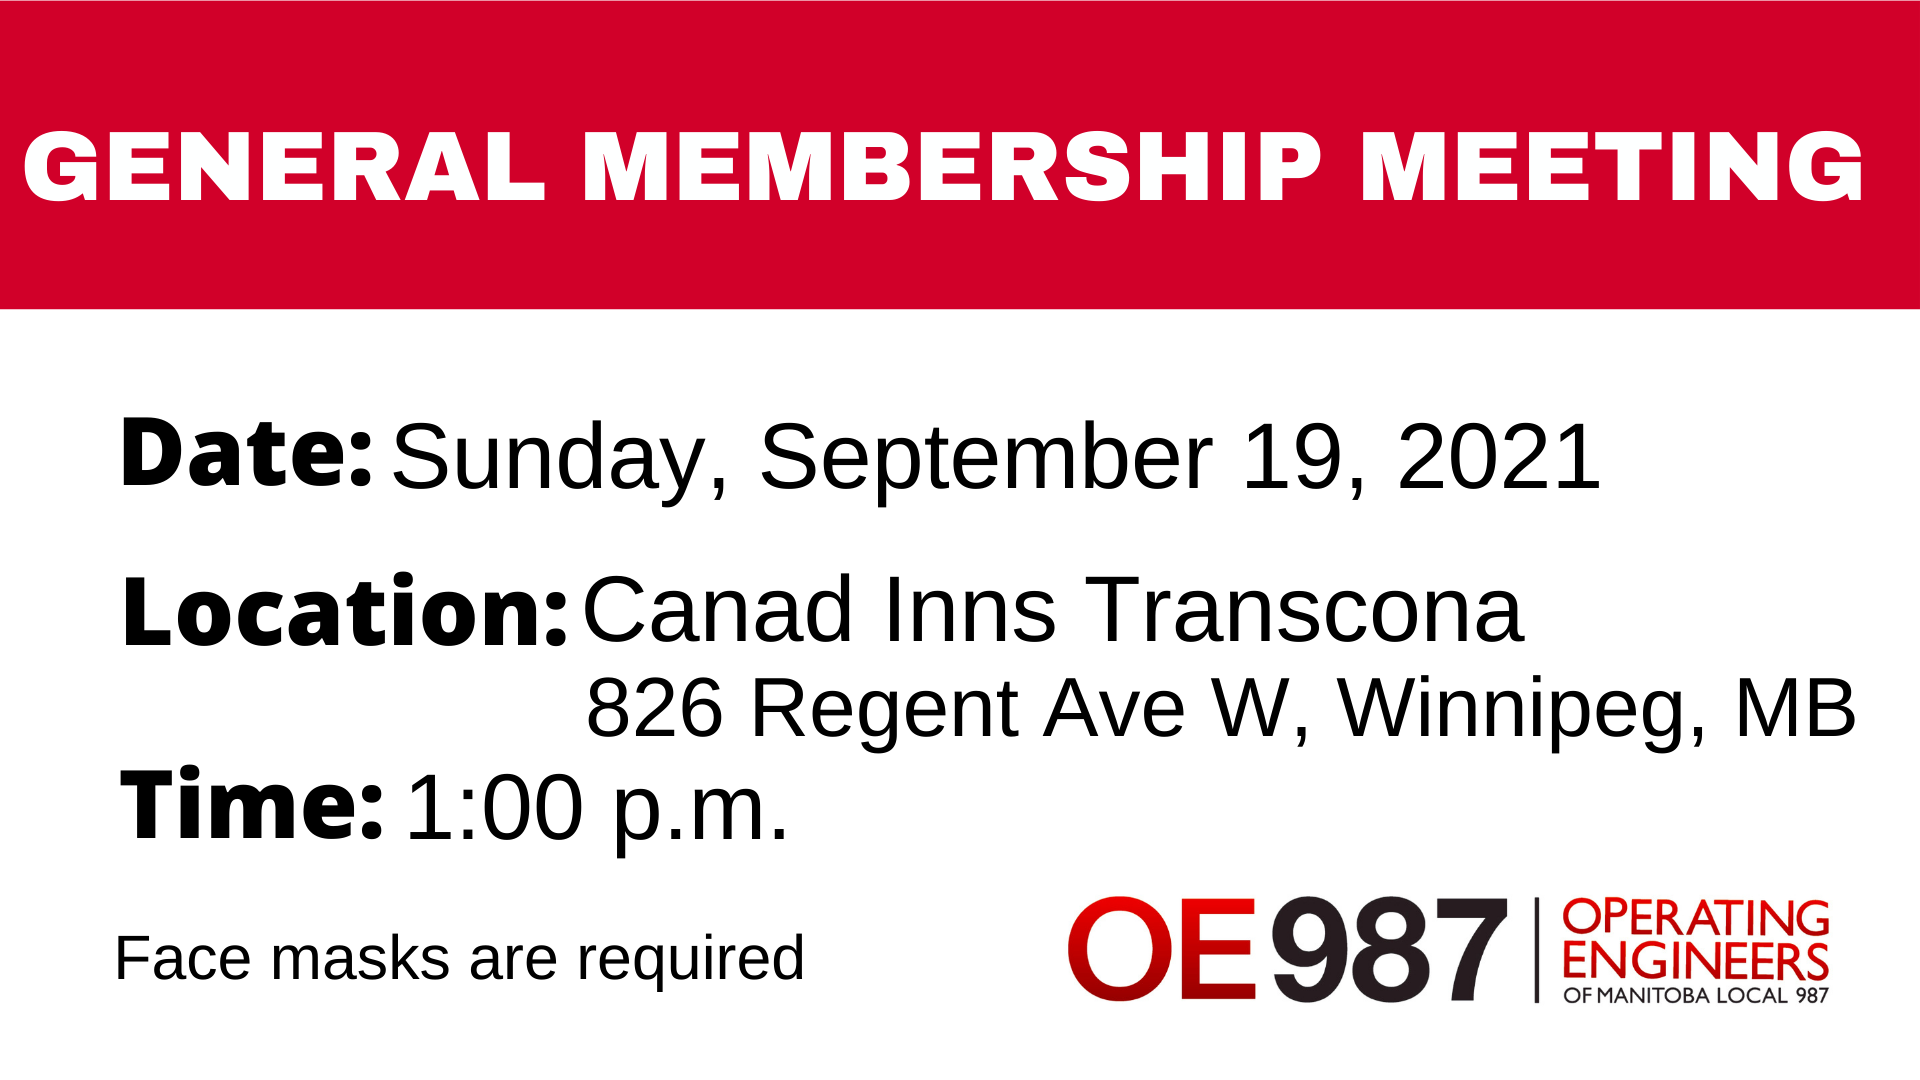 Image for General Membership Meeting – Sunday, September 19, 2021